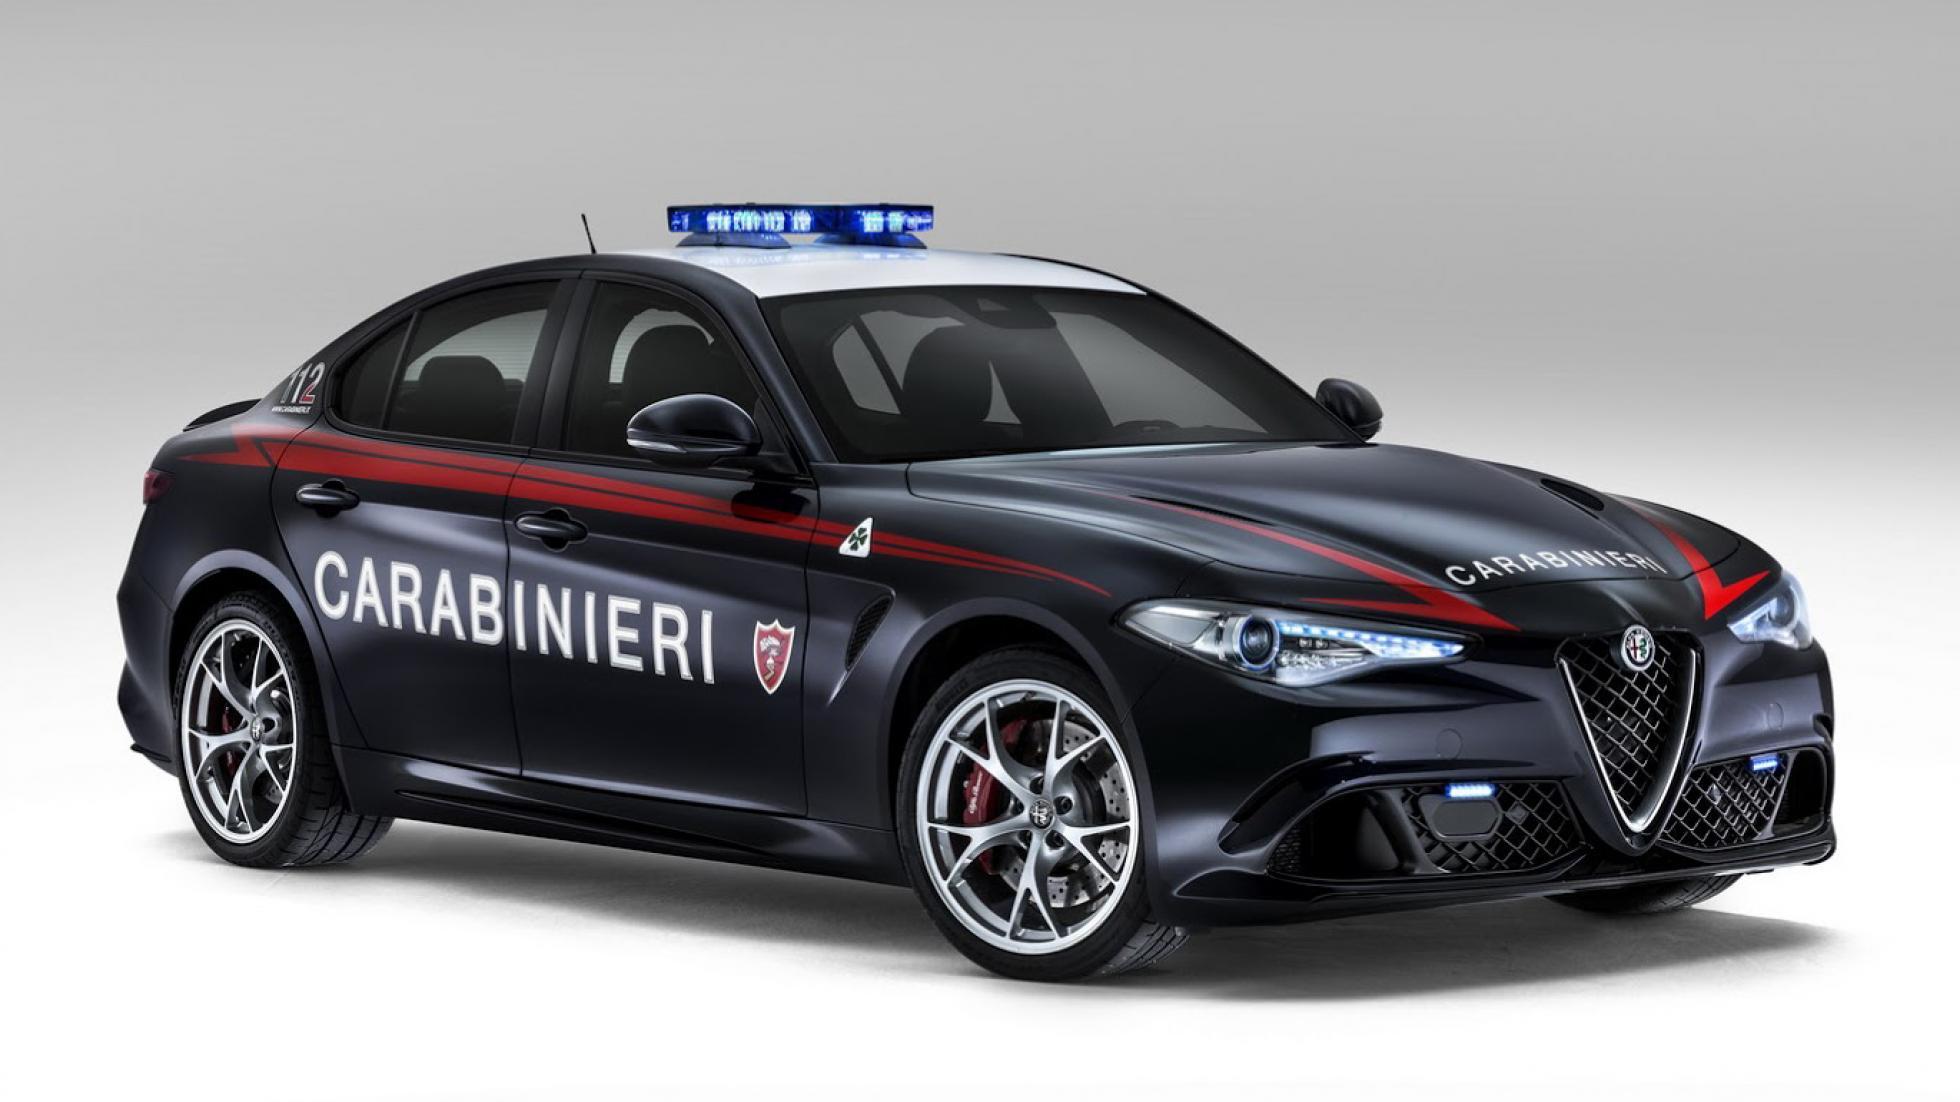 Alfa Romeo Giulia Quadrifoglio van de Carabinieri (Italiaanse politie)